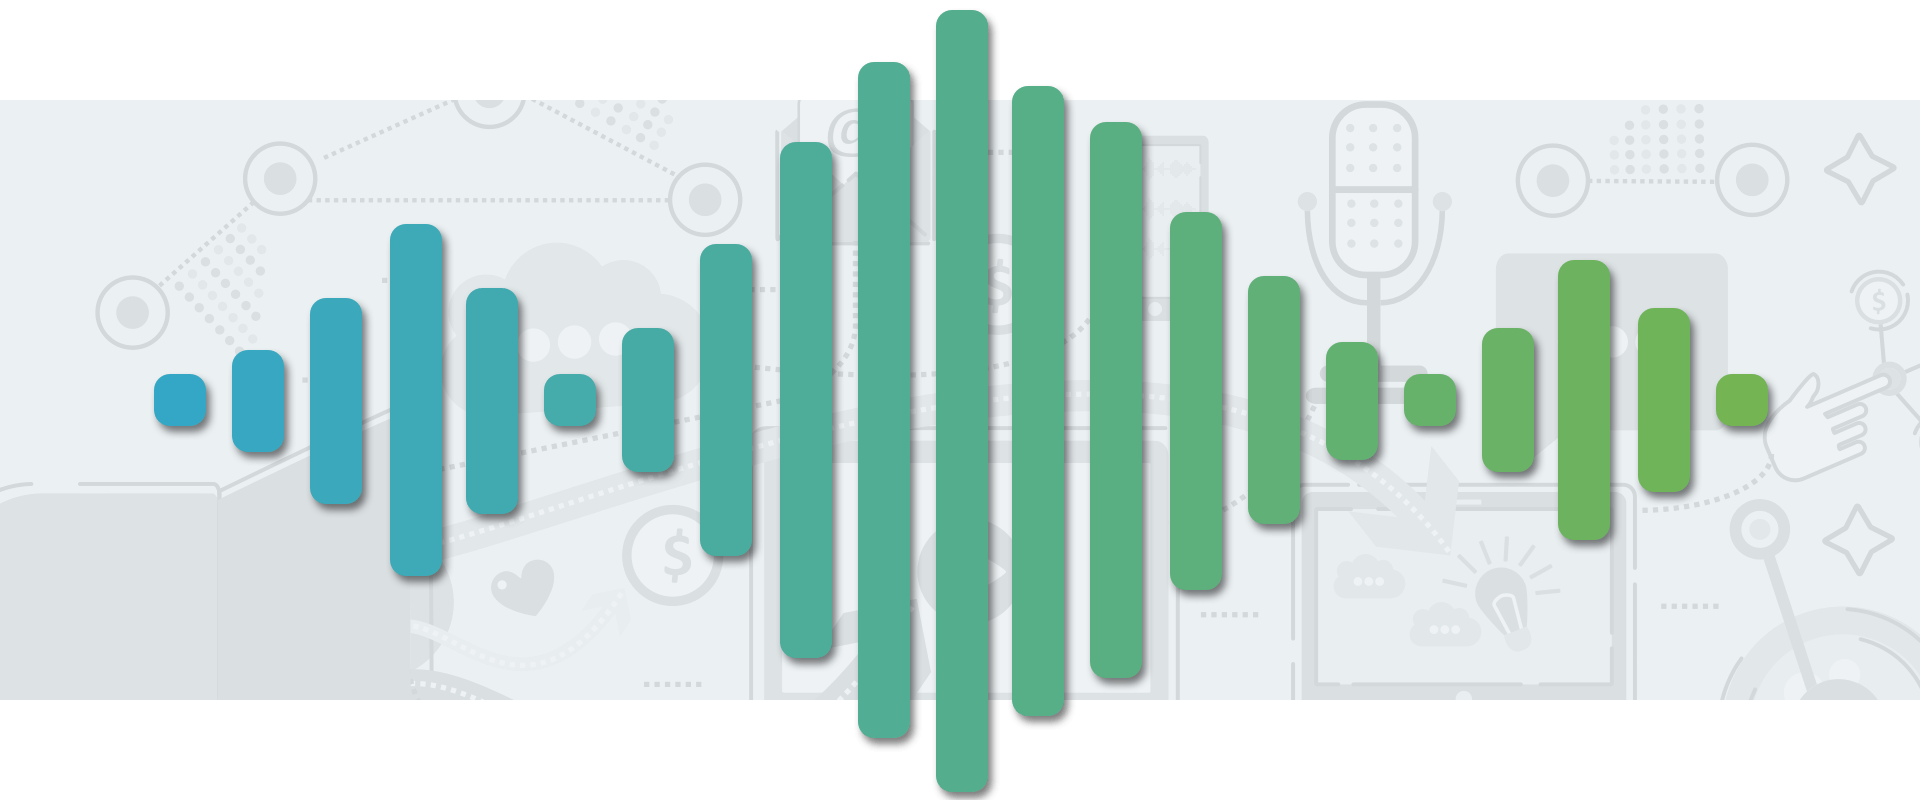 Improving podcast quality